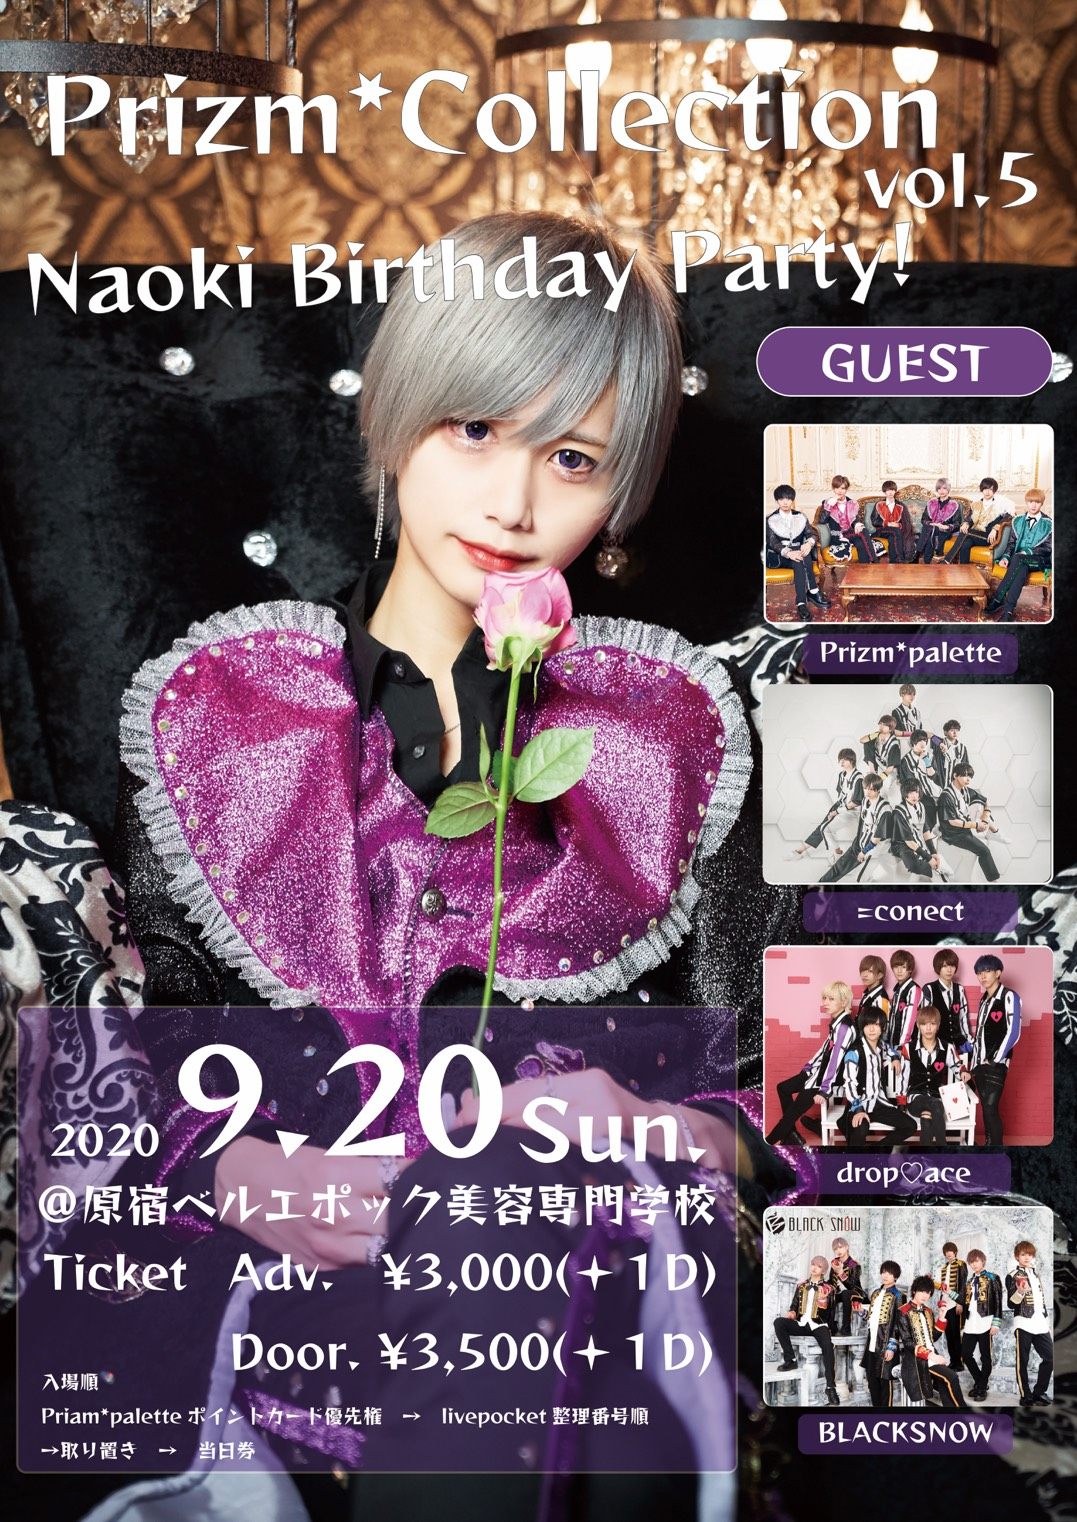 Prizm*Collection vol.5 Naoki Birthday Party!